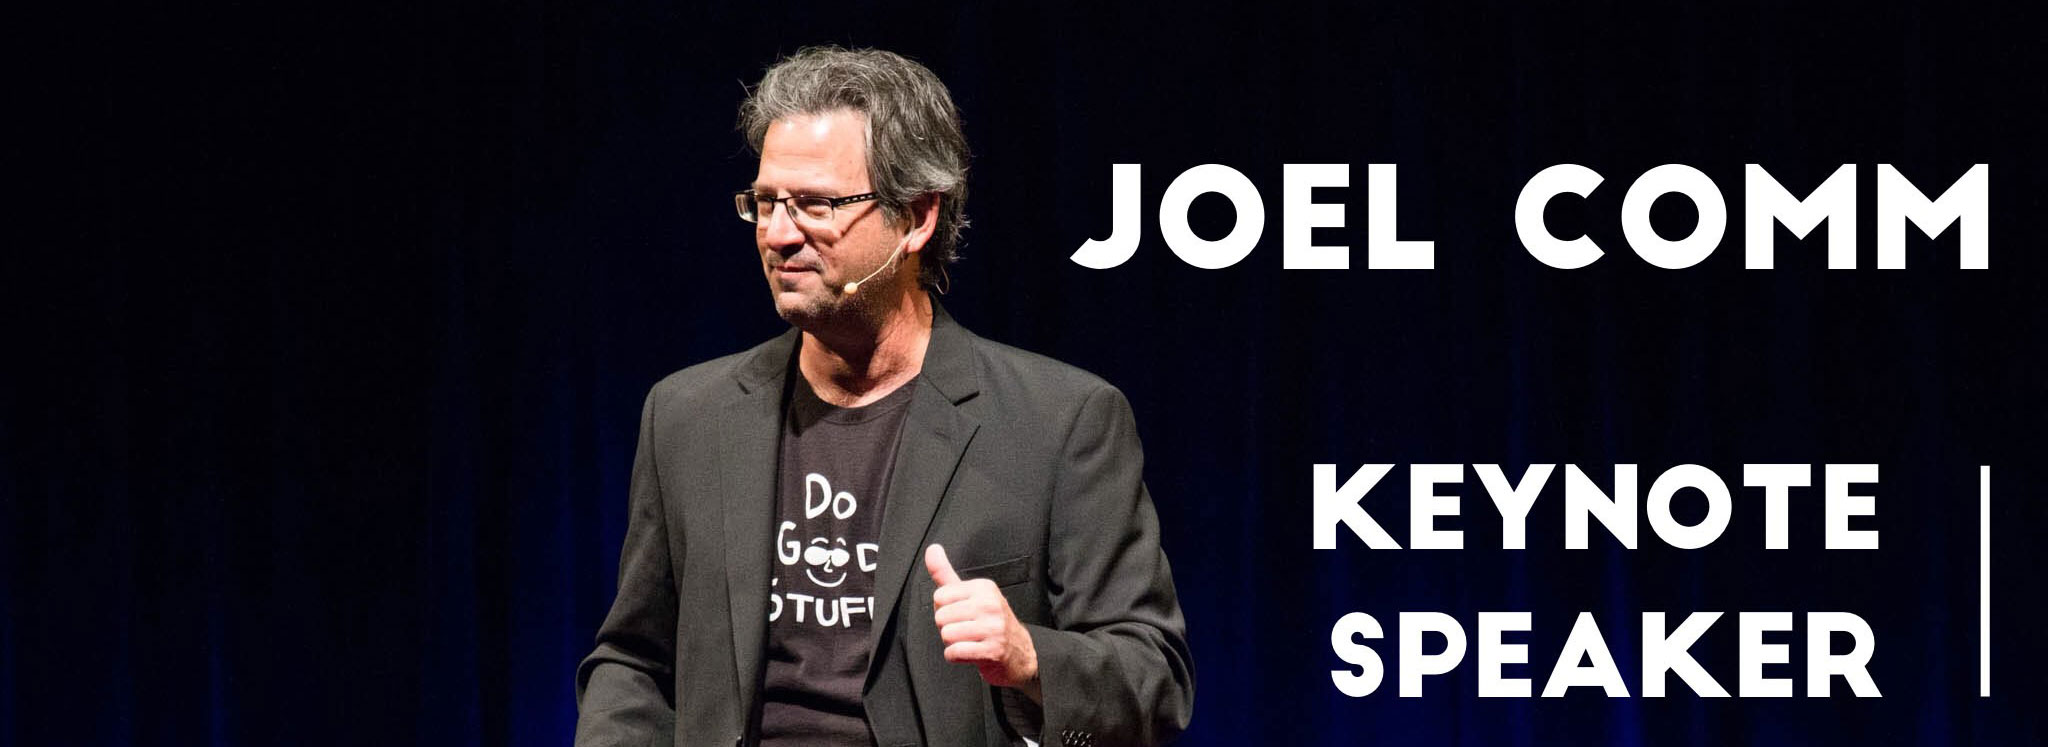 Joel Comm - Keynote Speaker at #aoc2018